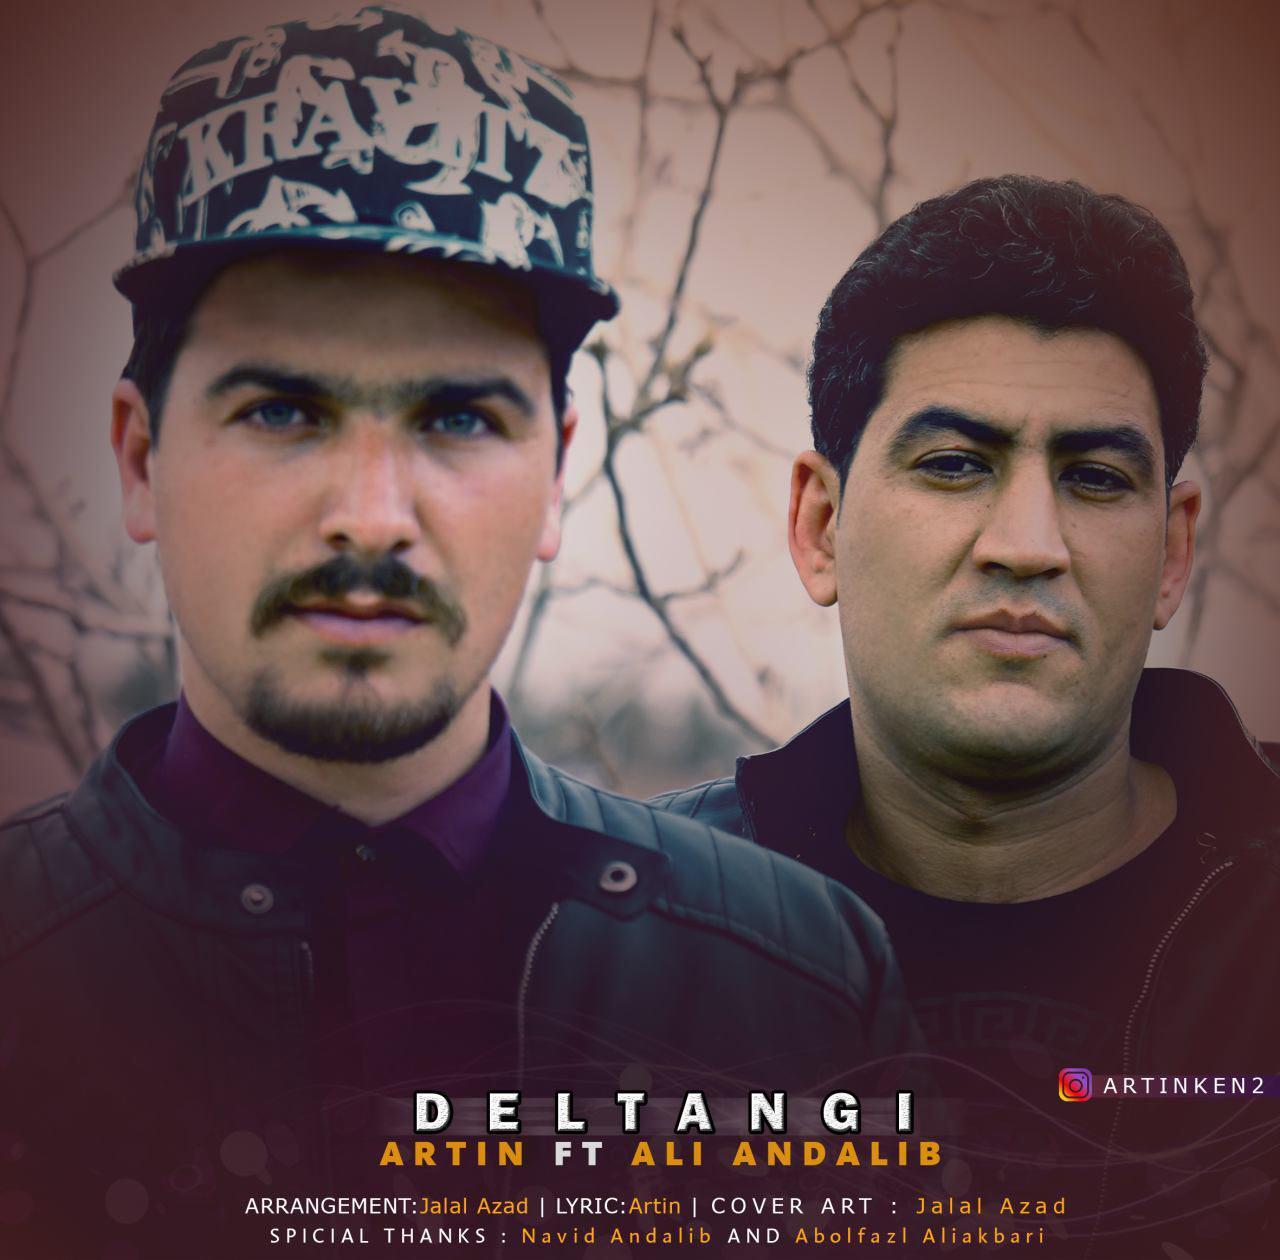 Artin – Deltangi (Ft Ali Andalib)